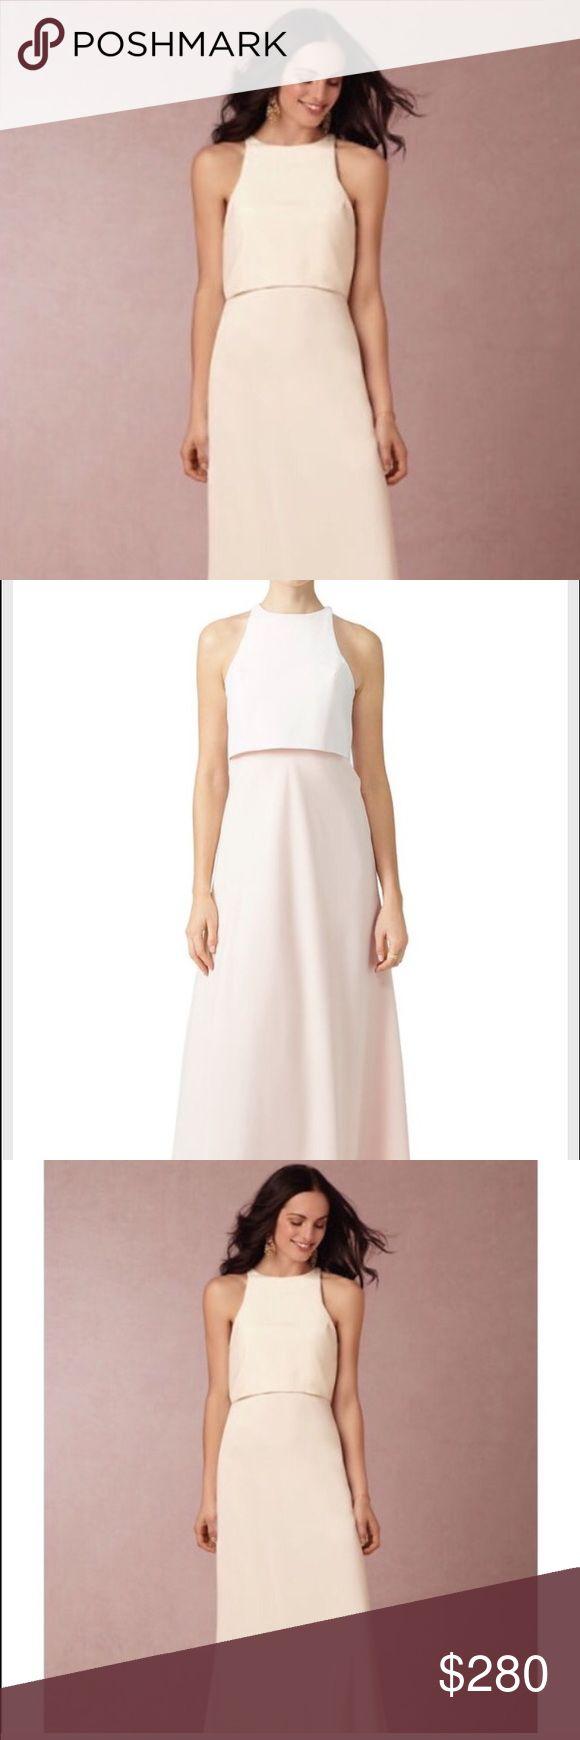 Jill Jill Stuart all white colorblock gown dress New with tag. Never been worn. Jill Stuart Dresses Wedding